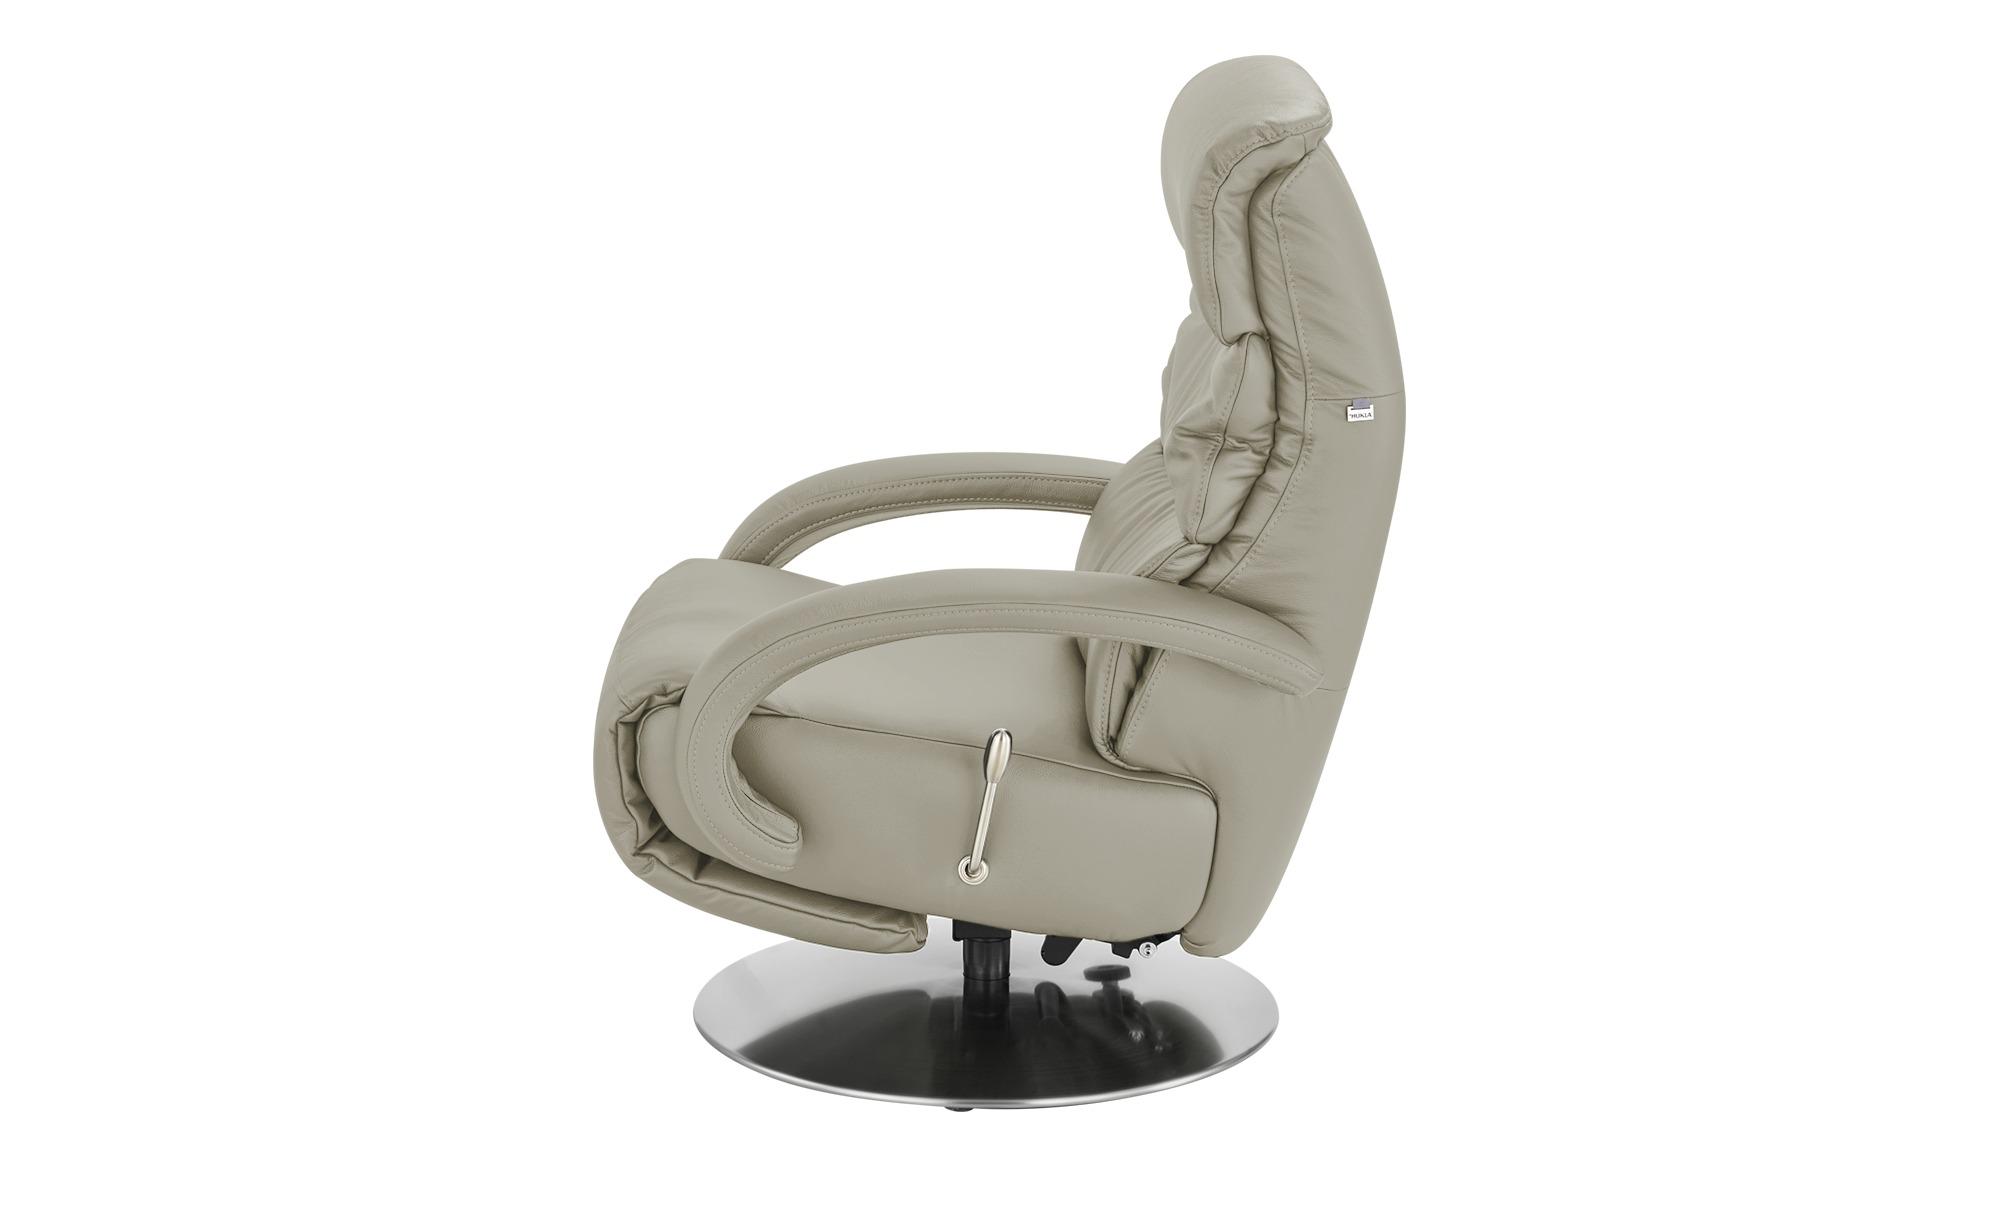 Hukla Leder-Relaxsessel  Florian ¦ grau ¦ Maße (cm): B: 73 H: 102 T: 91 Polstermöbel > Sessel > Fernsehsessel - Höffner